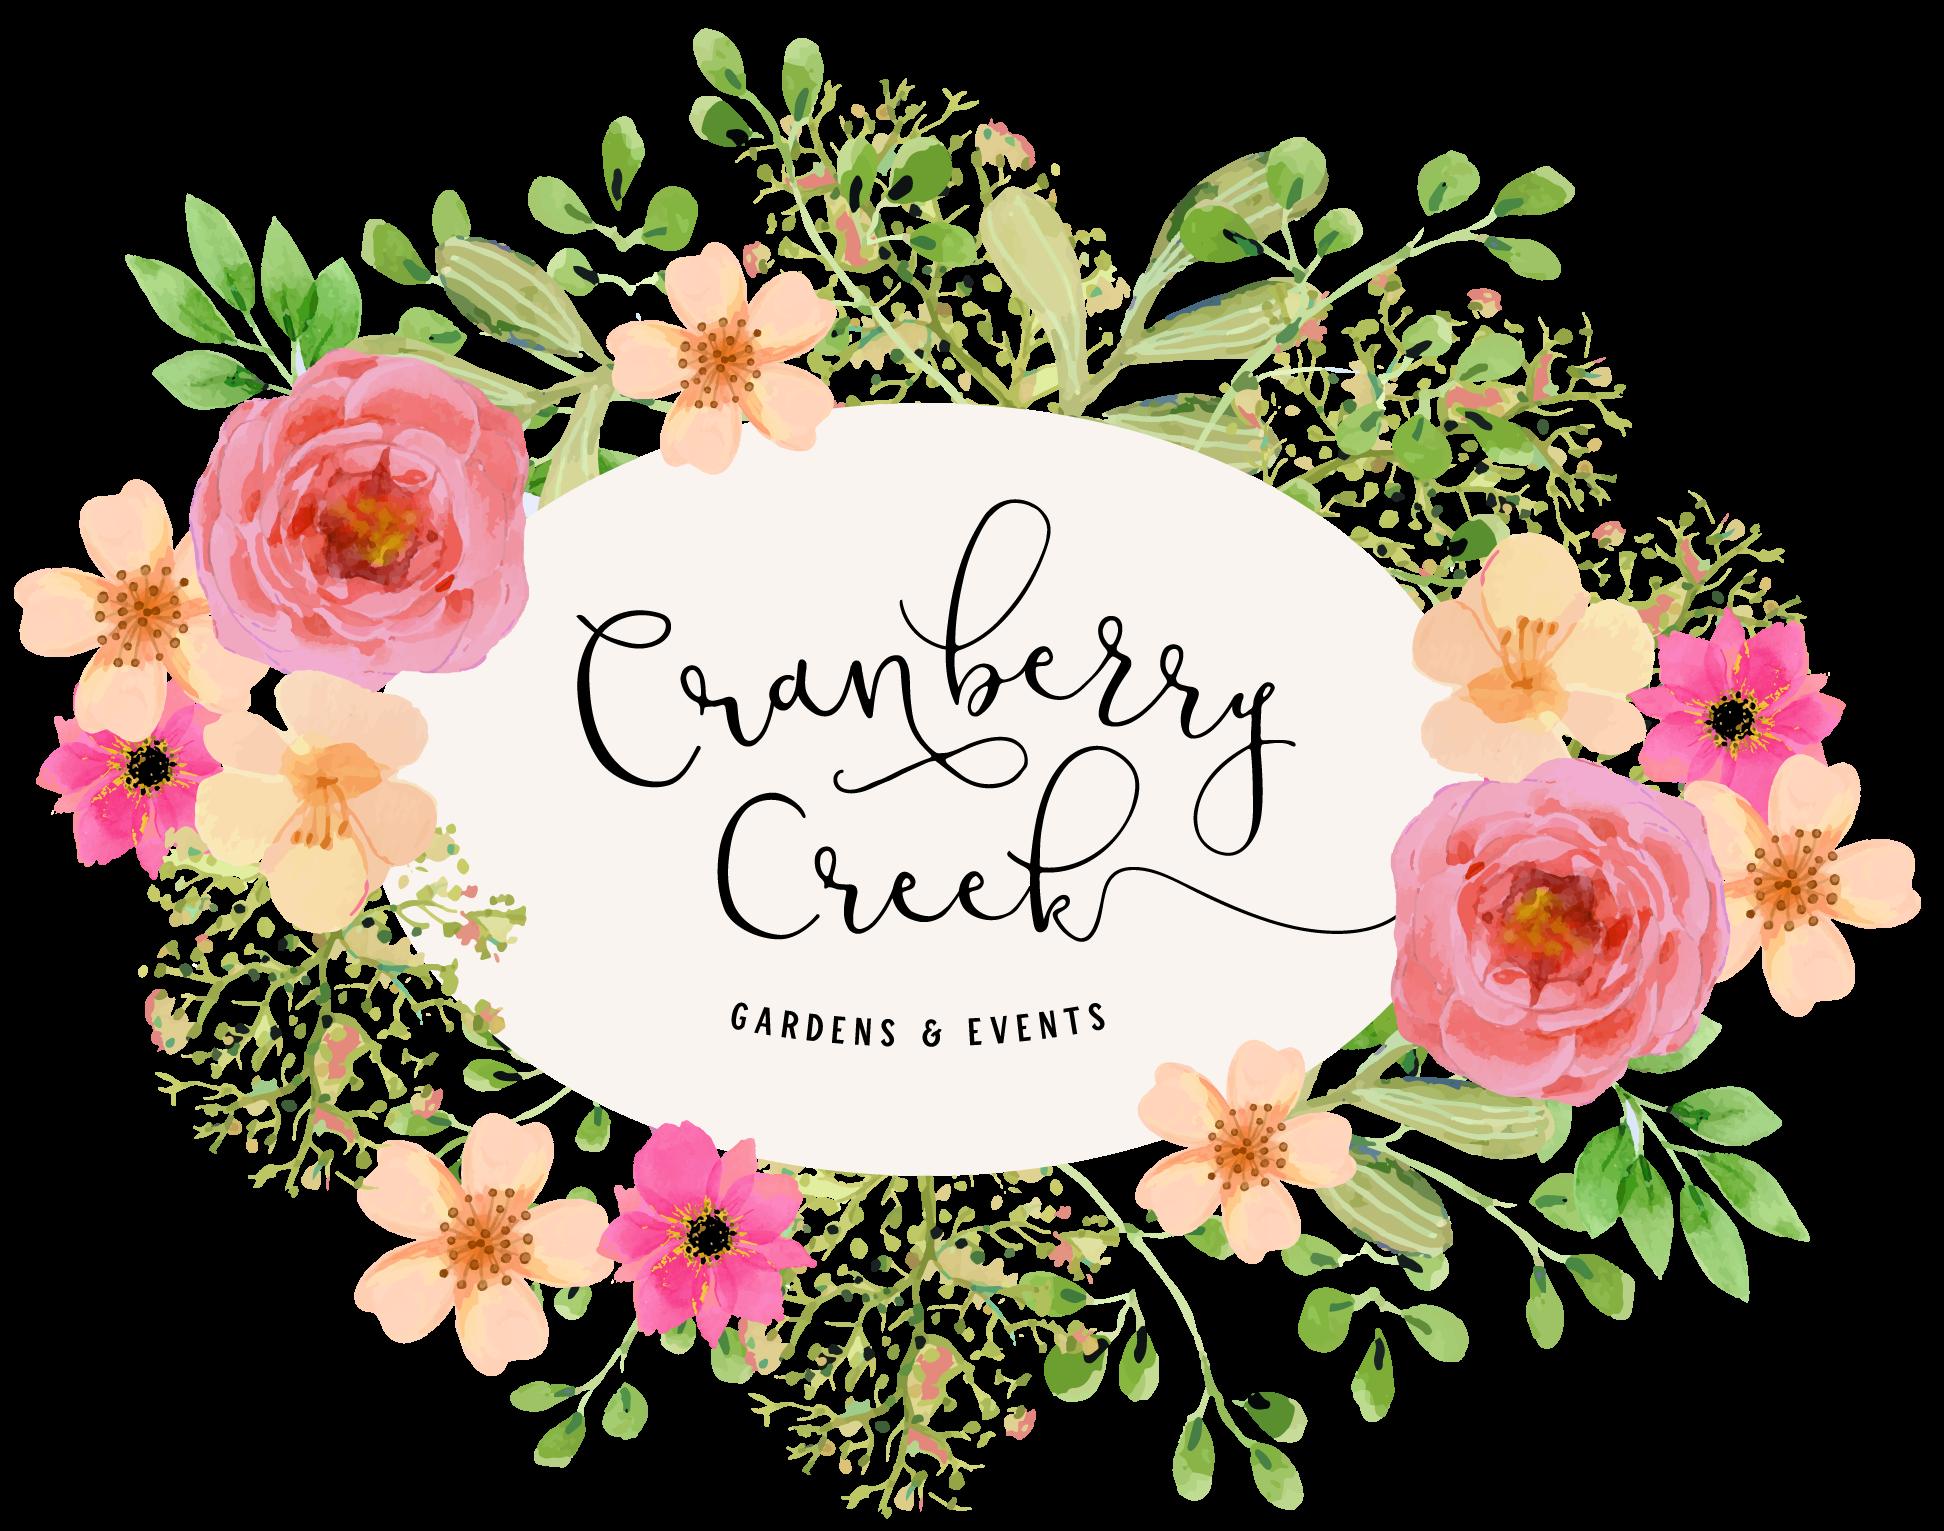 CranberryCreek